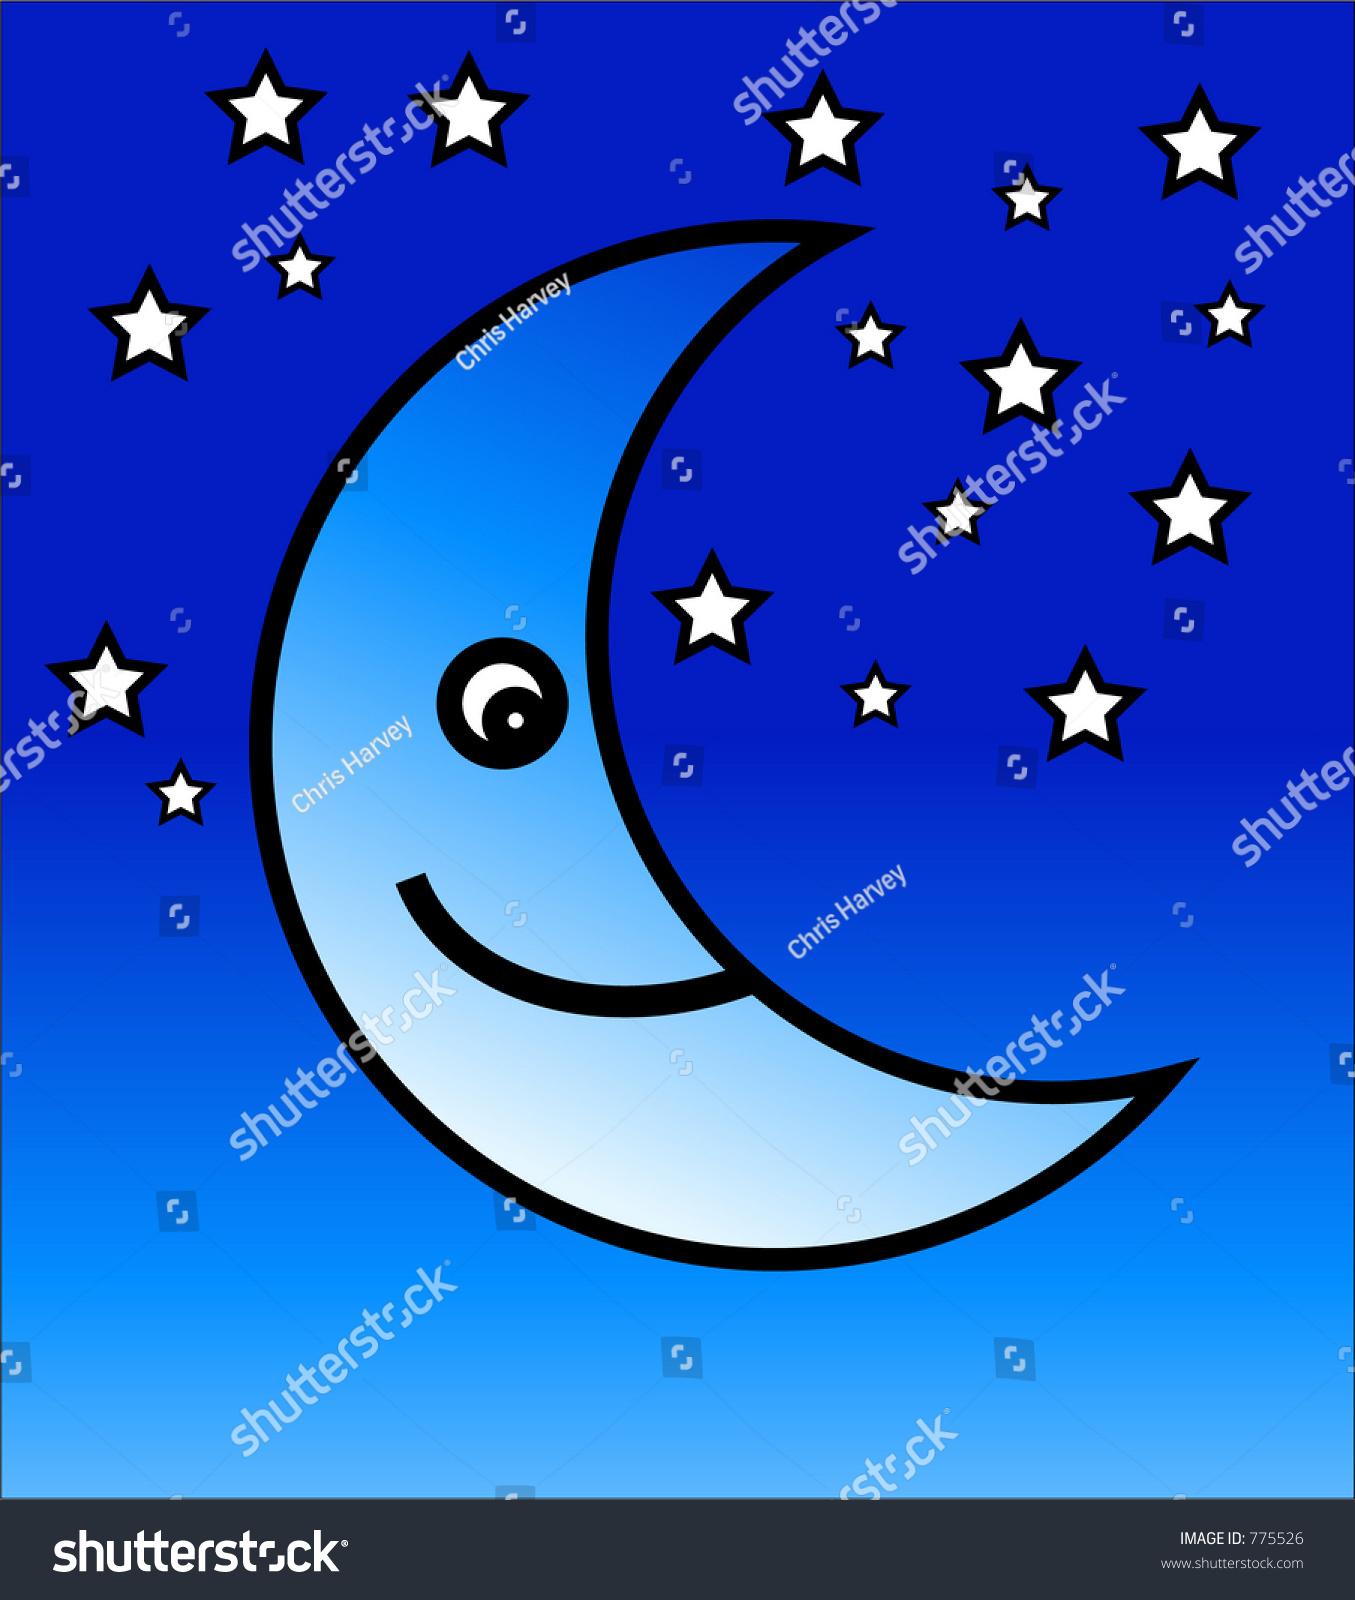 This crescent moon symbol stock illustration 775526 shutterstock this is a crescent moon symbol biocorpaavc Gallery